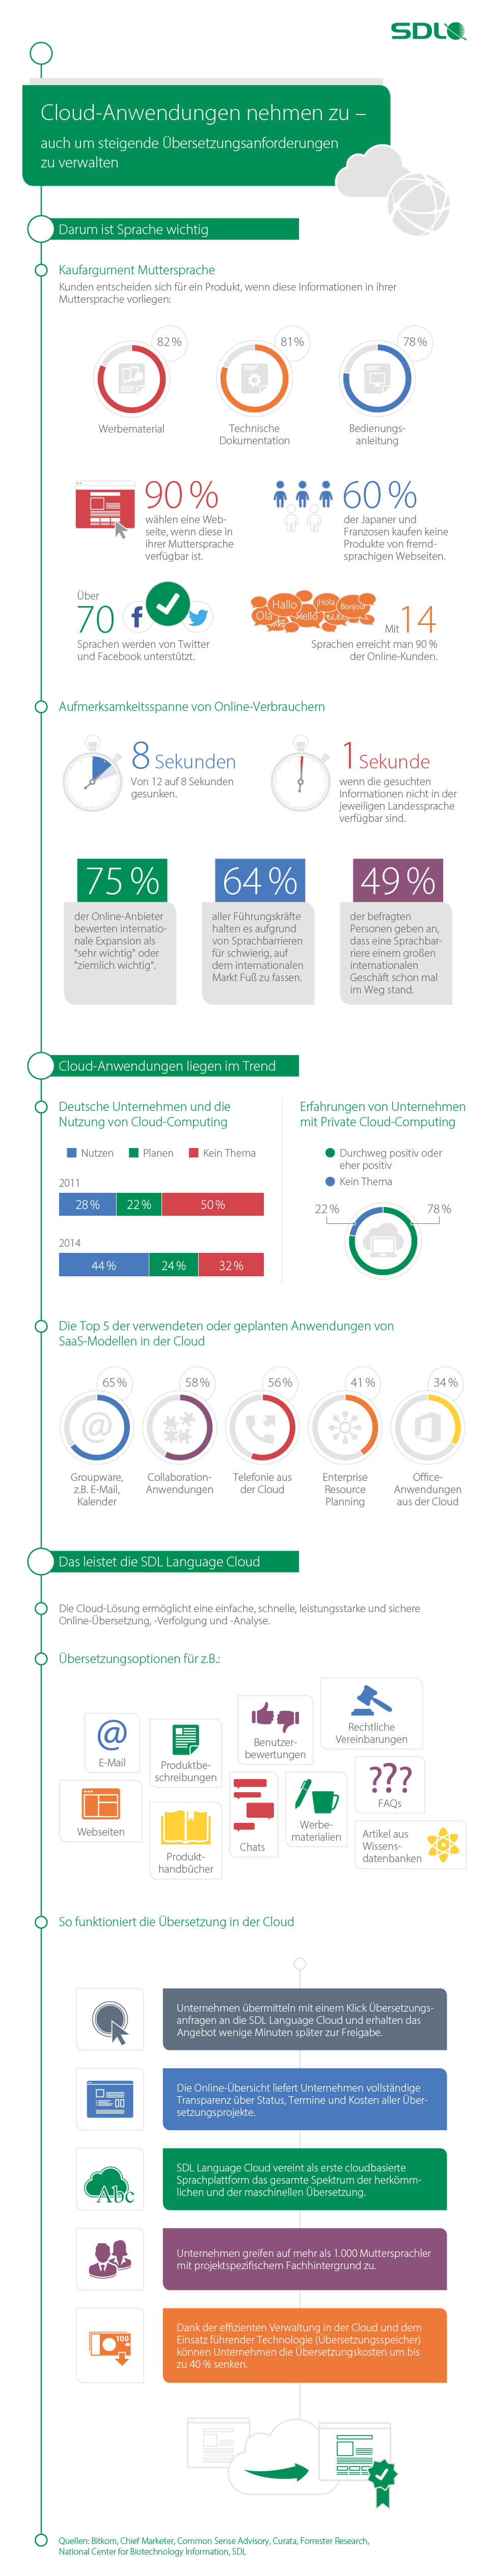 Infografik: Übersetzungslösungen aus der Cloud | Statista